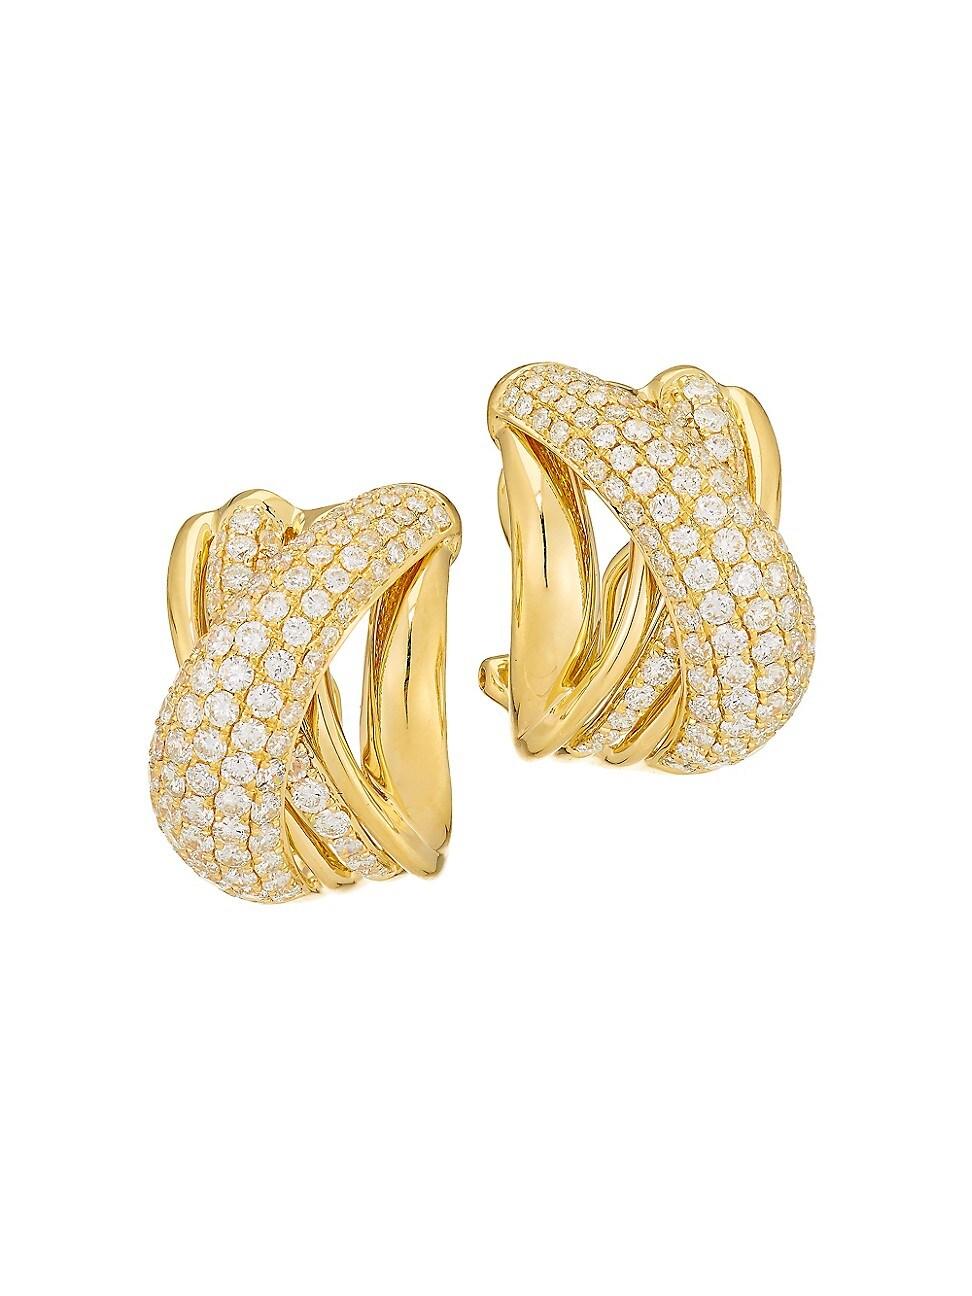 Alberto Milani WOMEN'S VIA BRERA 18K YELLOW GOLD & PAVÉ DIAMOND CRISSCROSS EARRINGS